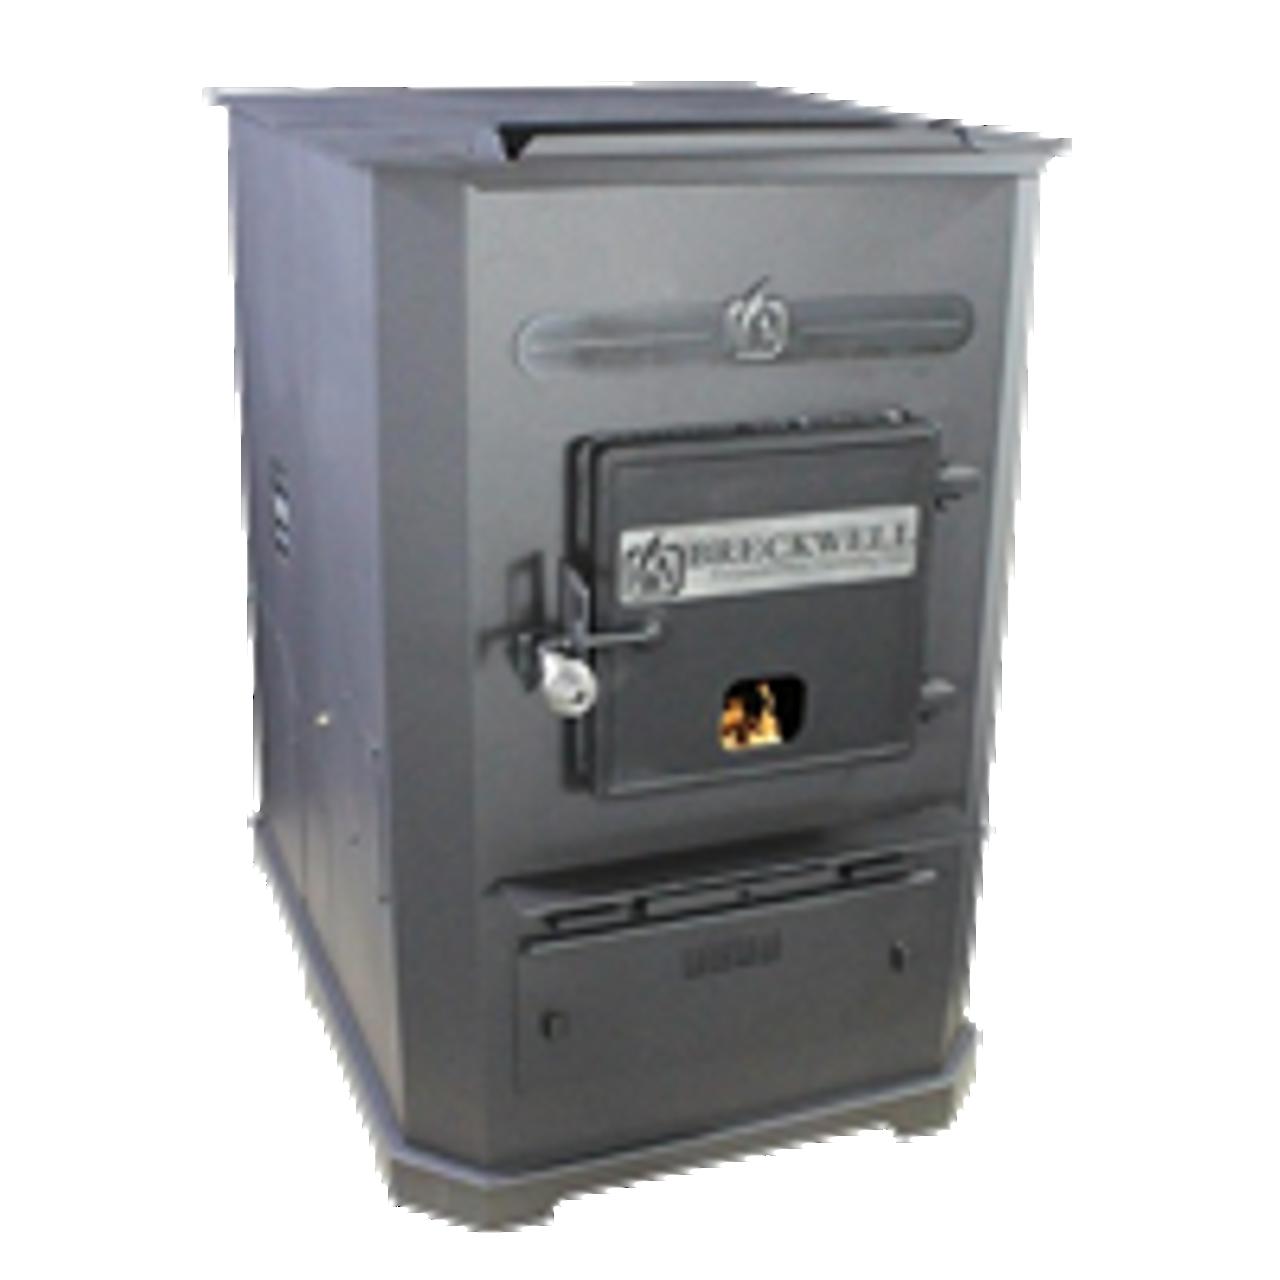 SP8500 Multi-Fuel Parts